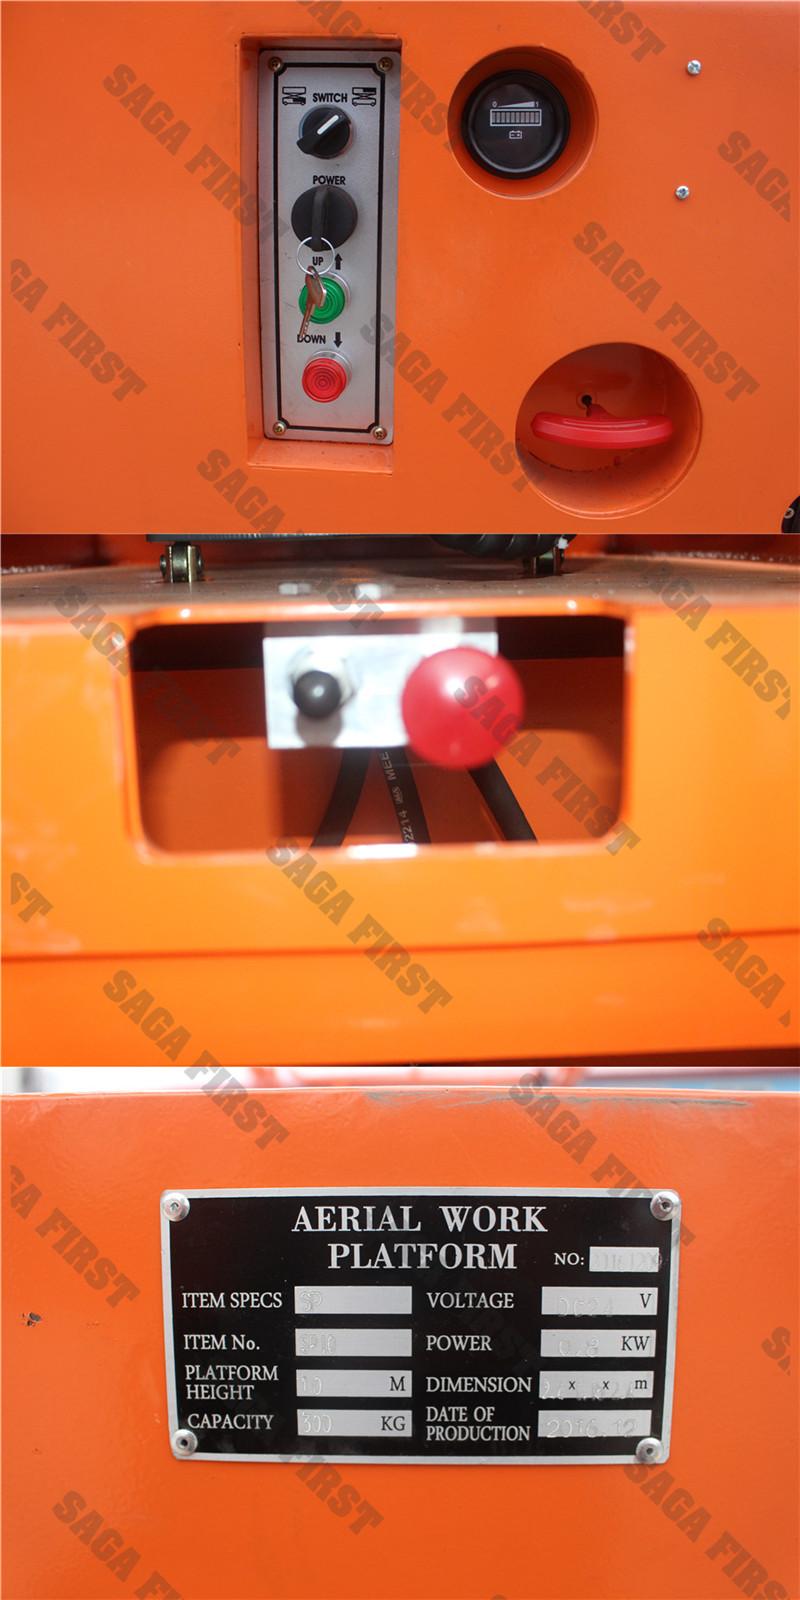 Hydraulic Drive Scissor Lift